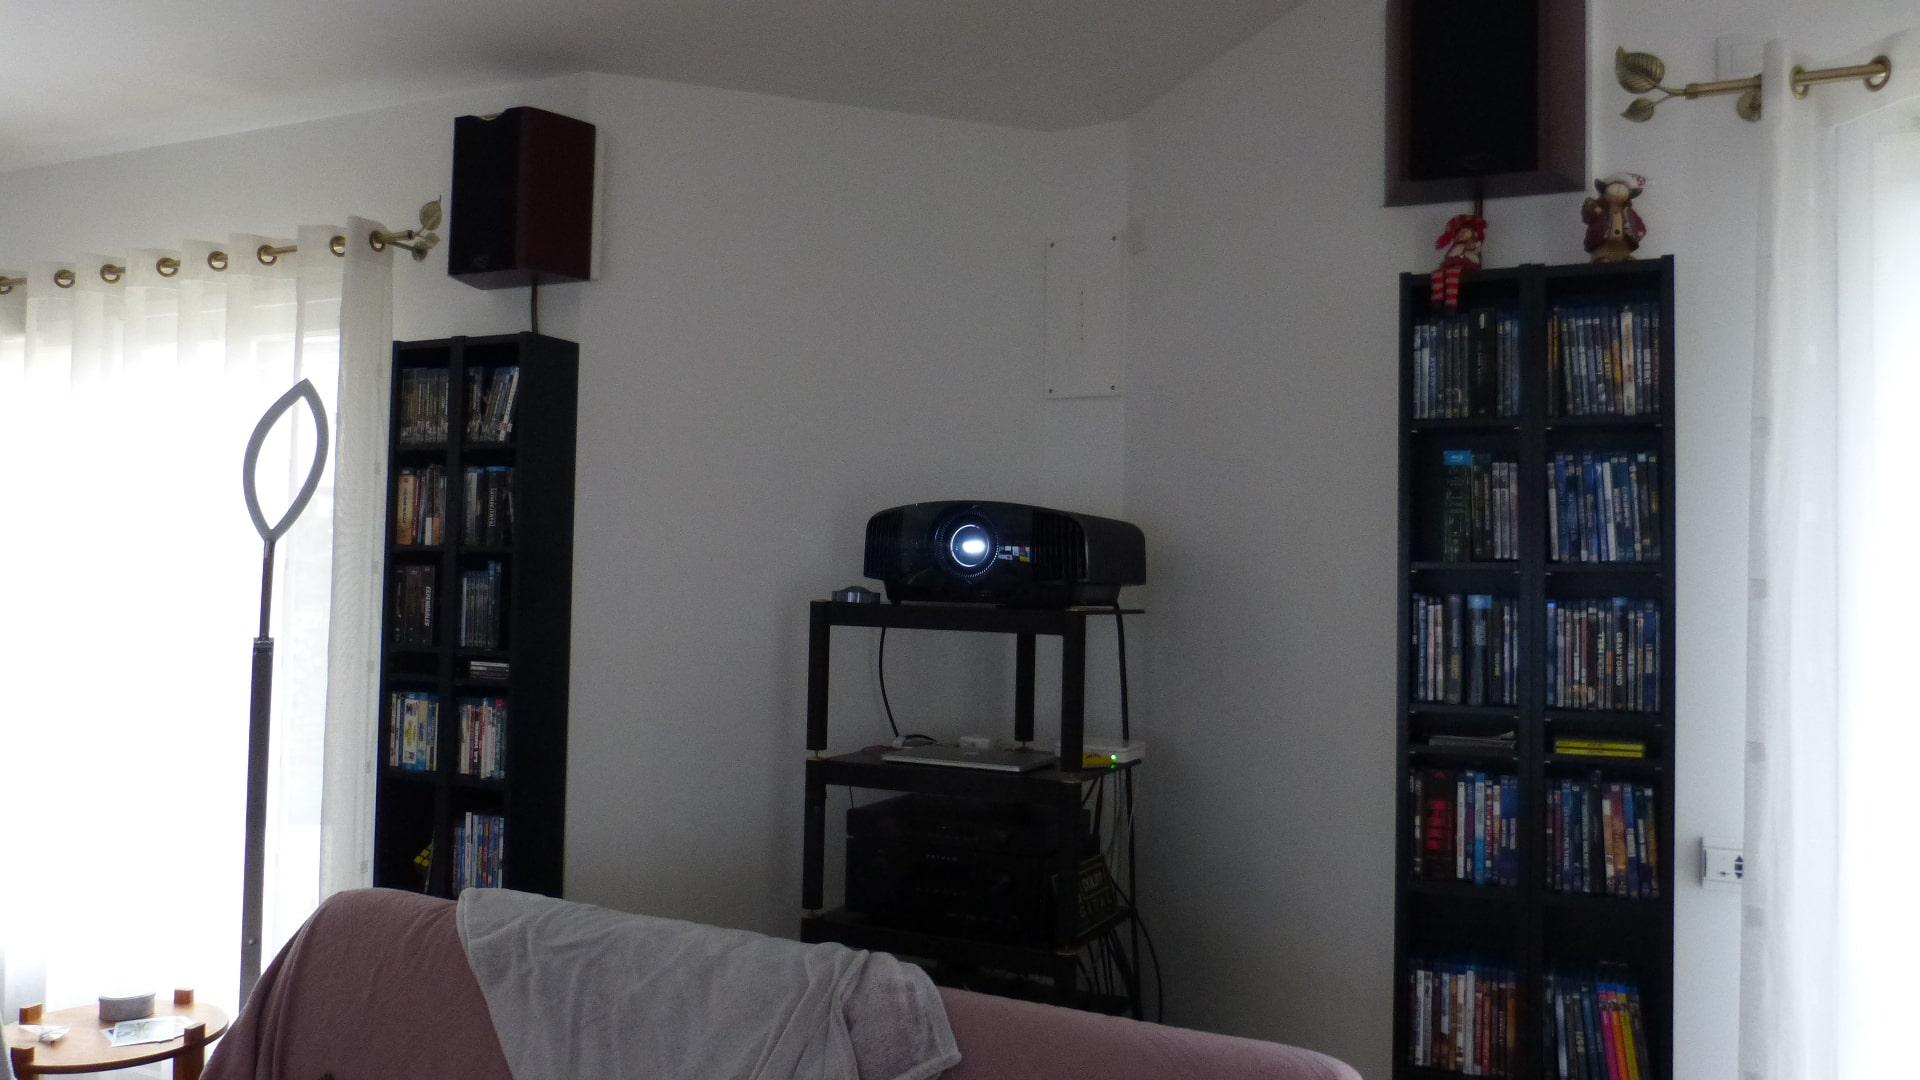 Calibrage d'un projecteur Sony VPL-VW270ES